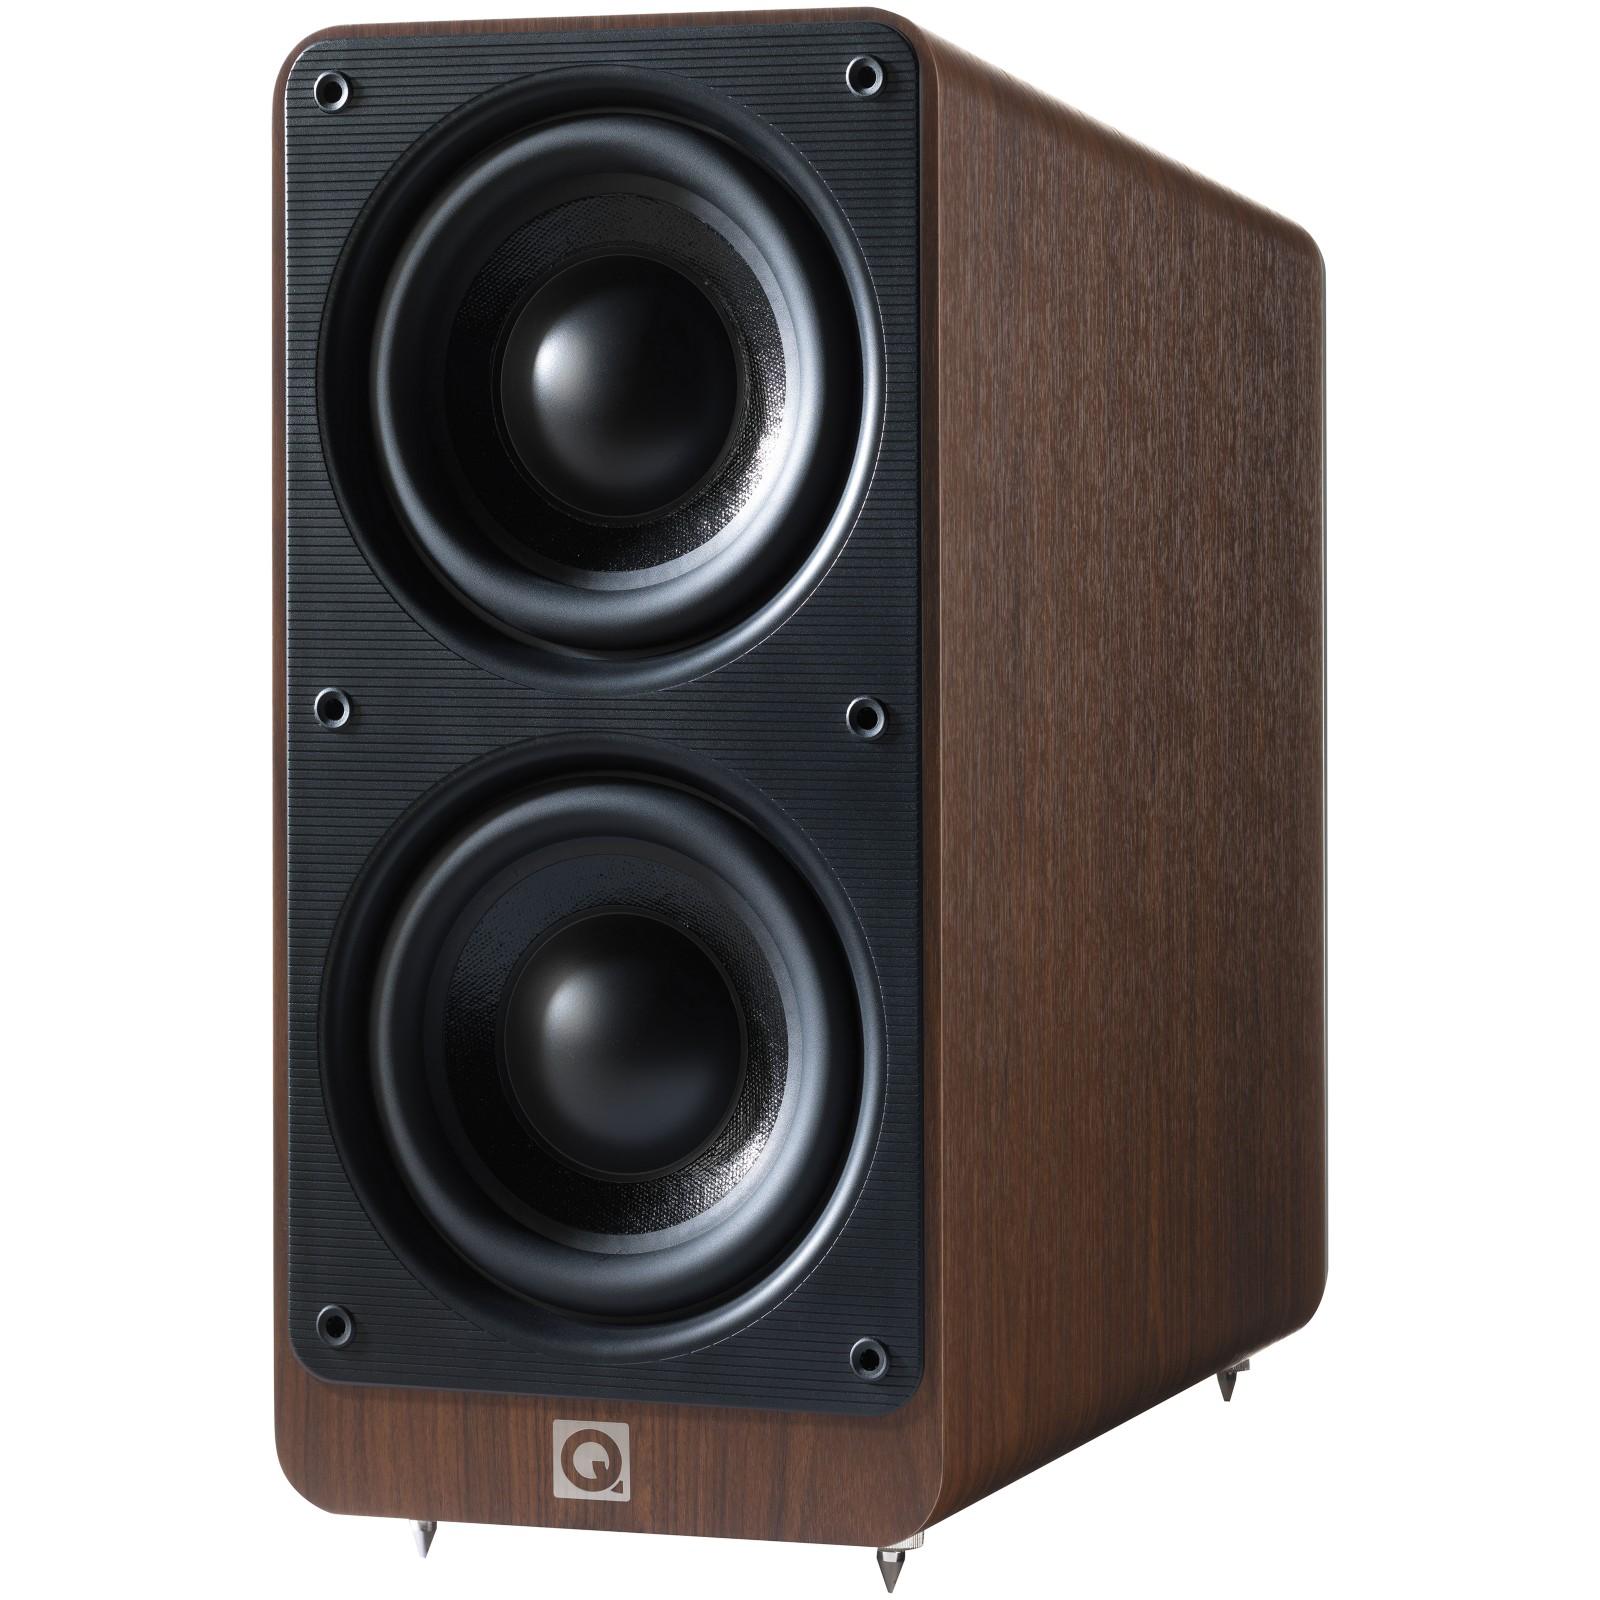 Q Acoustics 2070Si Subwoofer Walnut